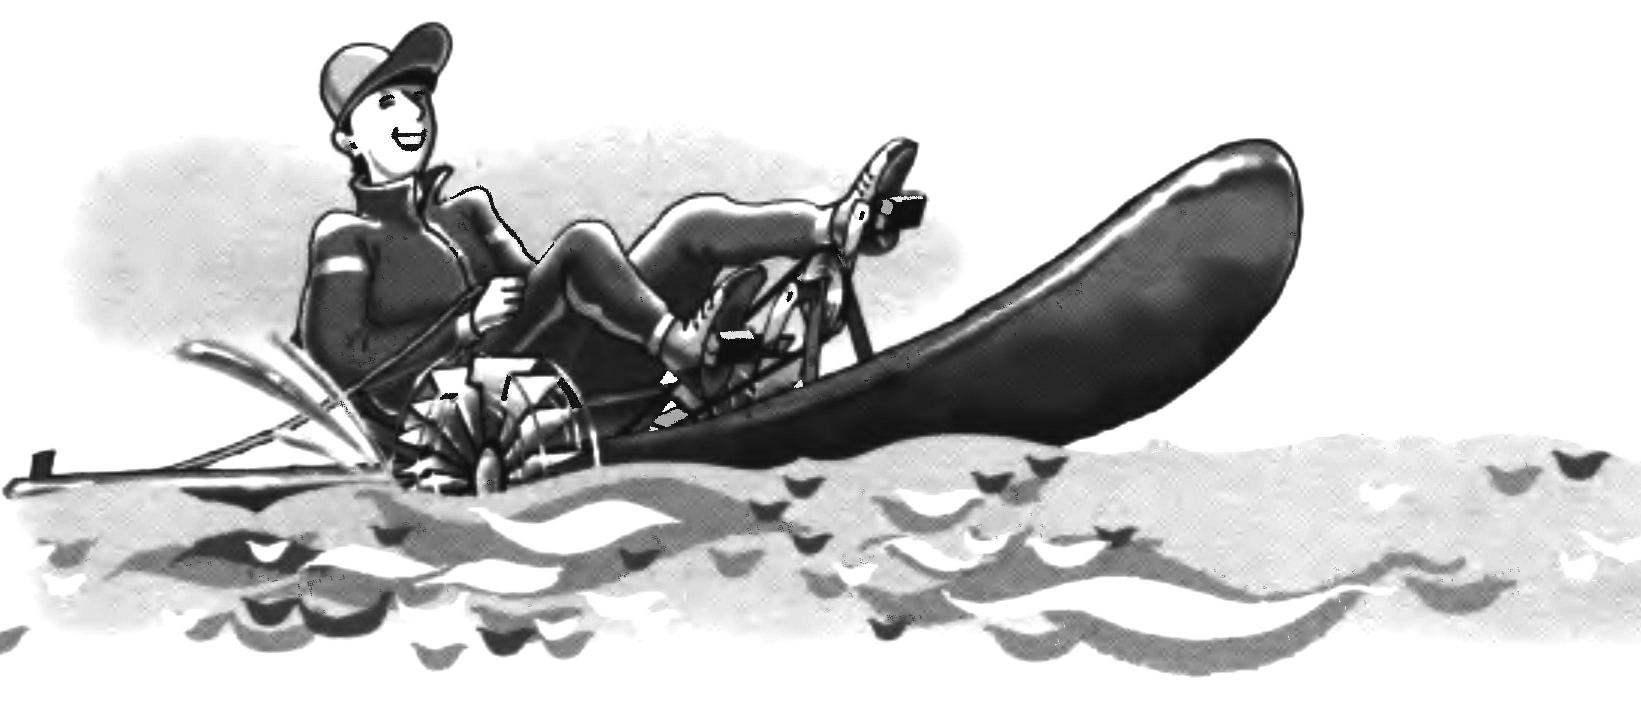 PEDAL SURFER